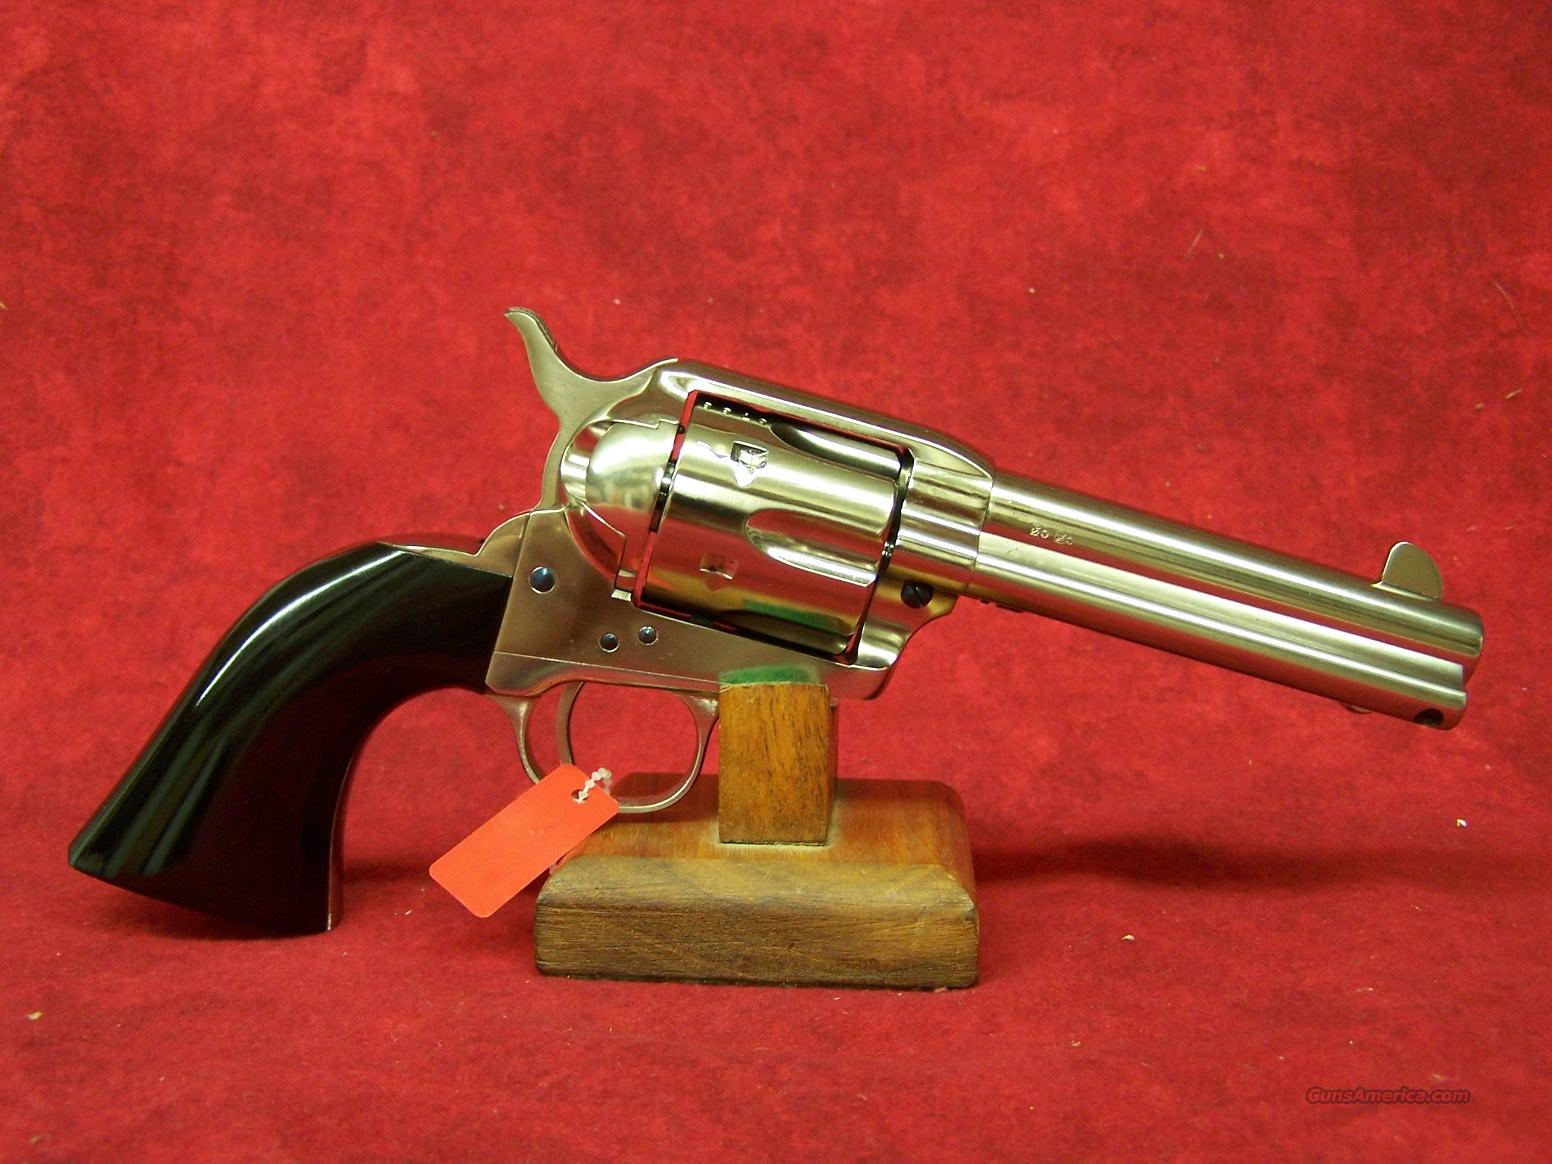 "Uberti 1873 Cattleman Desperado NM Nickel w/Bison Horn Style Grips .45LC 4 3/4"" (356030)  Guns > Pistols > Uberti Pistols > Ctg."